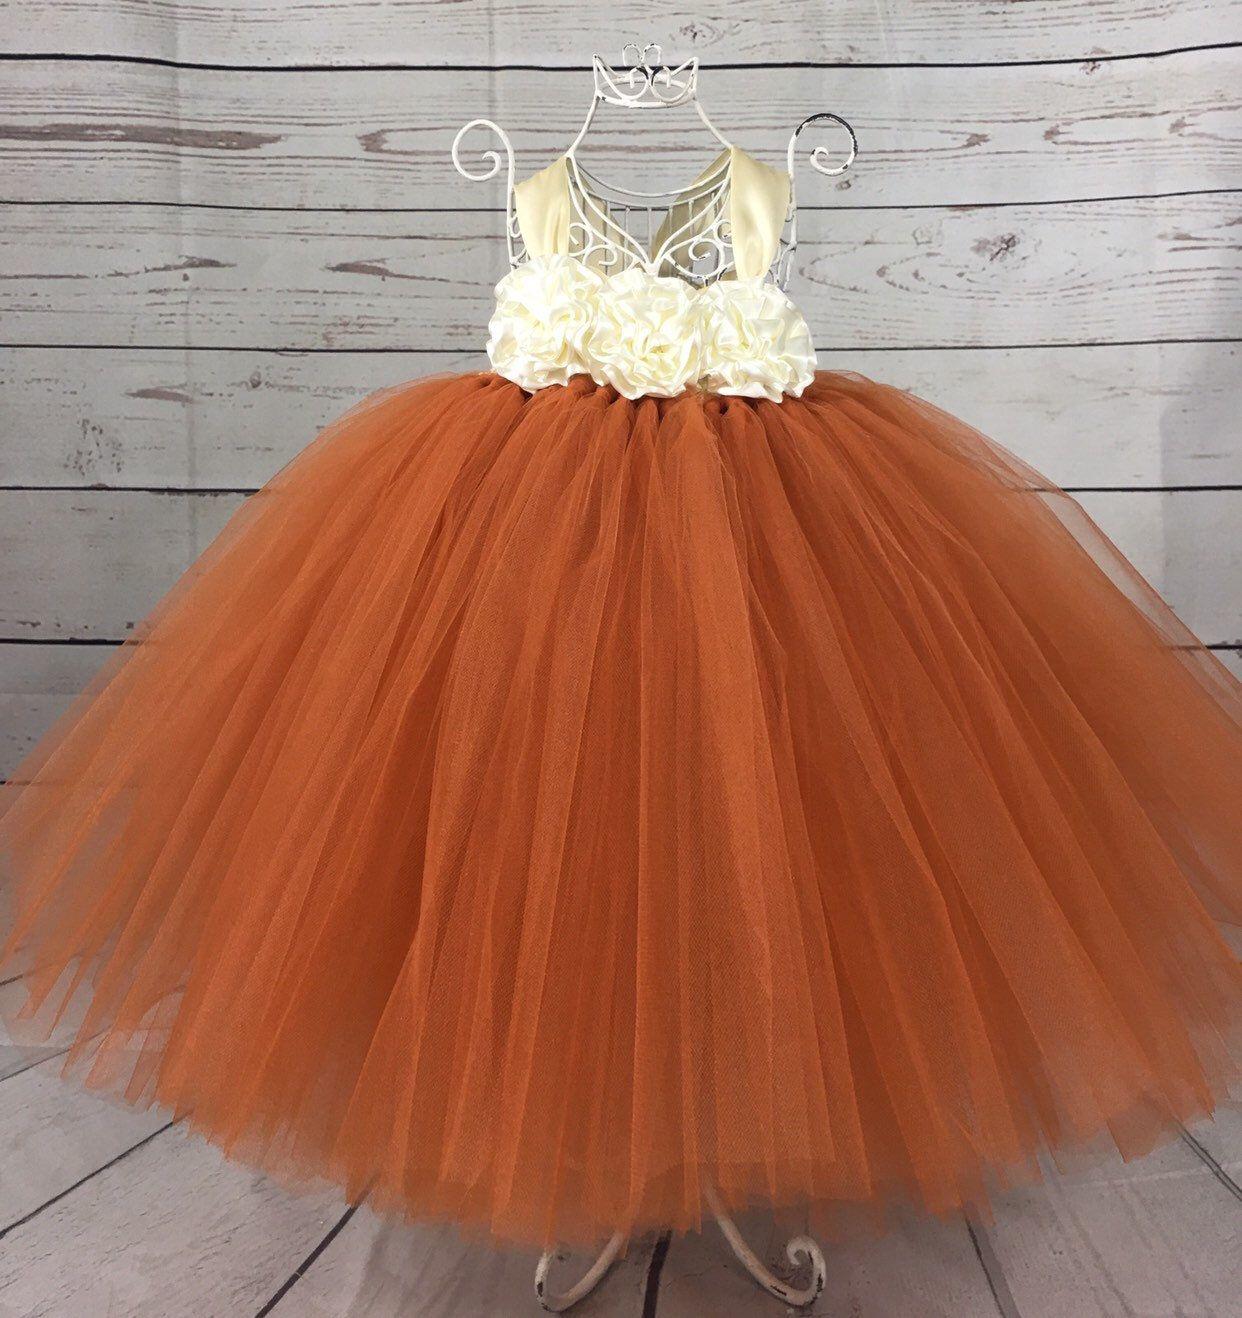 27+ Orange wedding dress shop ideas